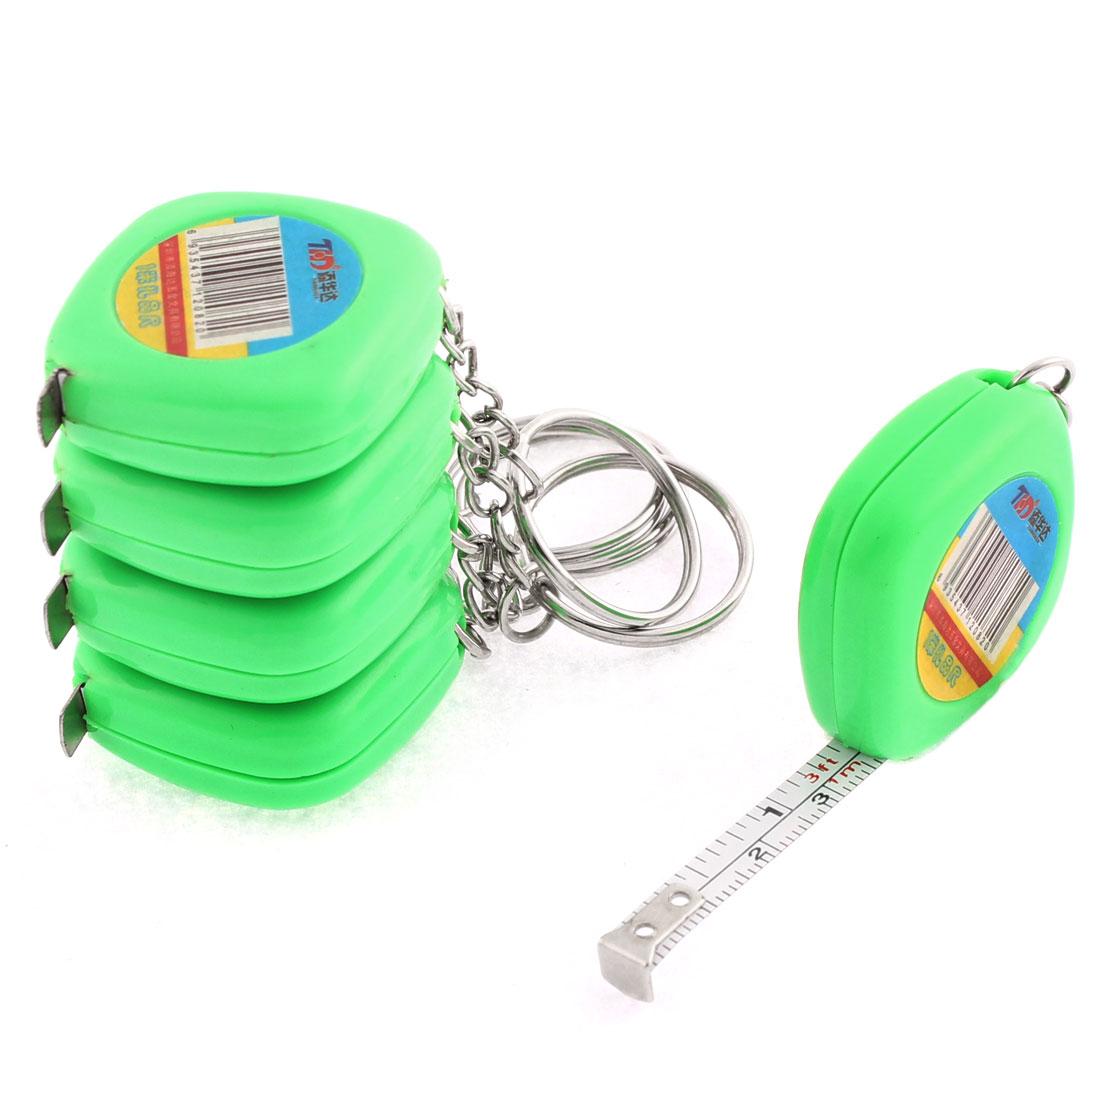 Plastic Case Split Ring Retractable Metric Ruler Tape 1M 3Ft Green 5 Pcs